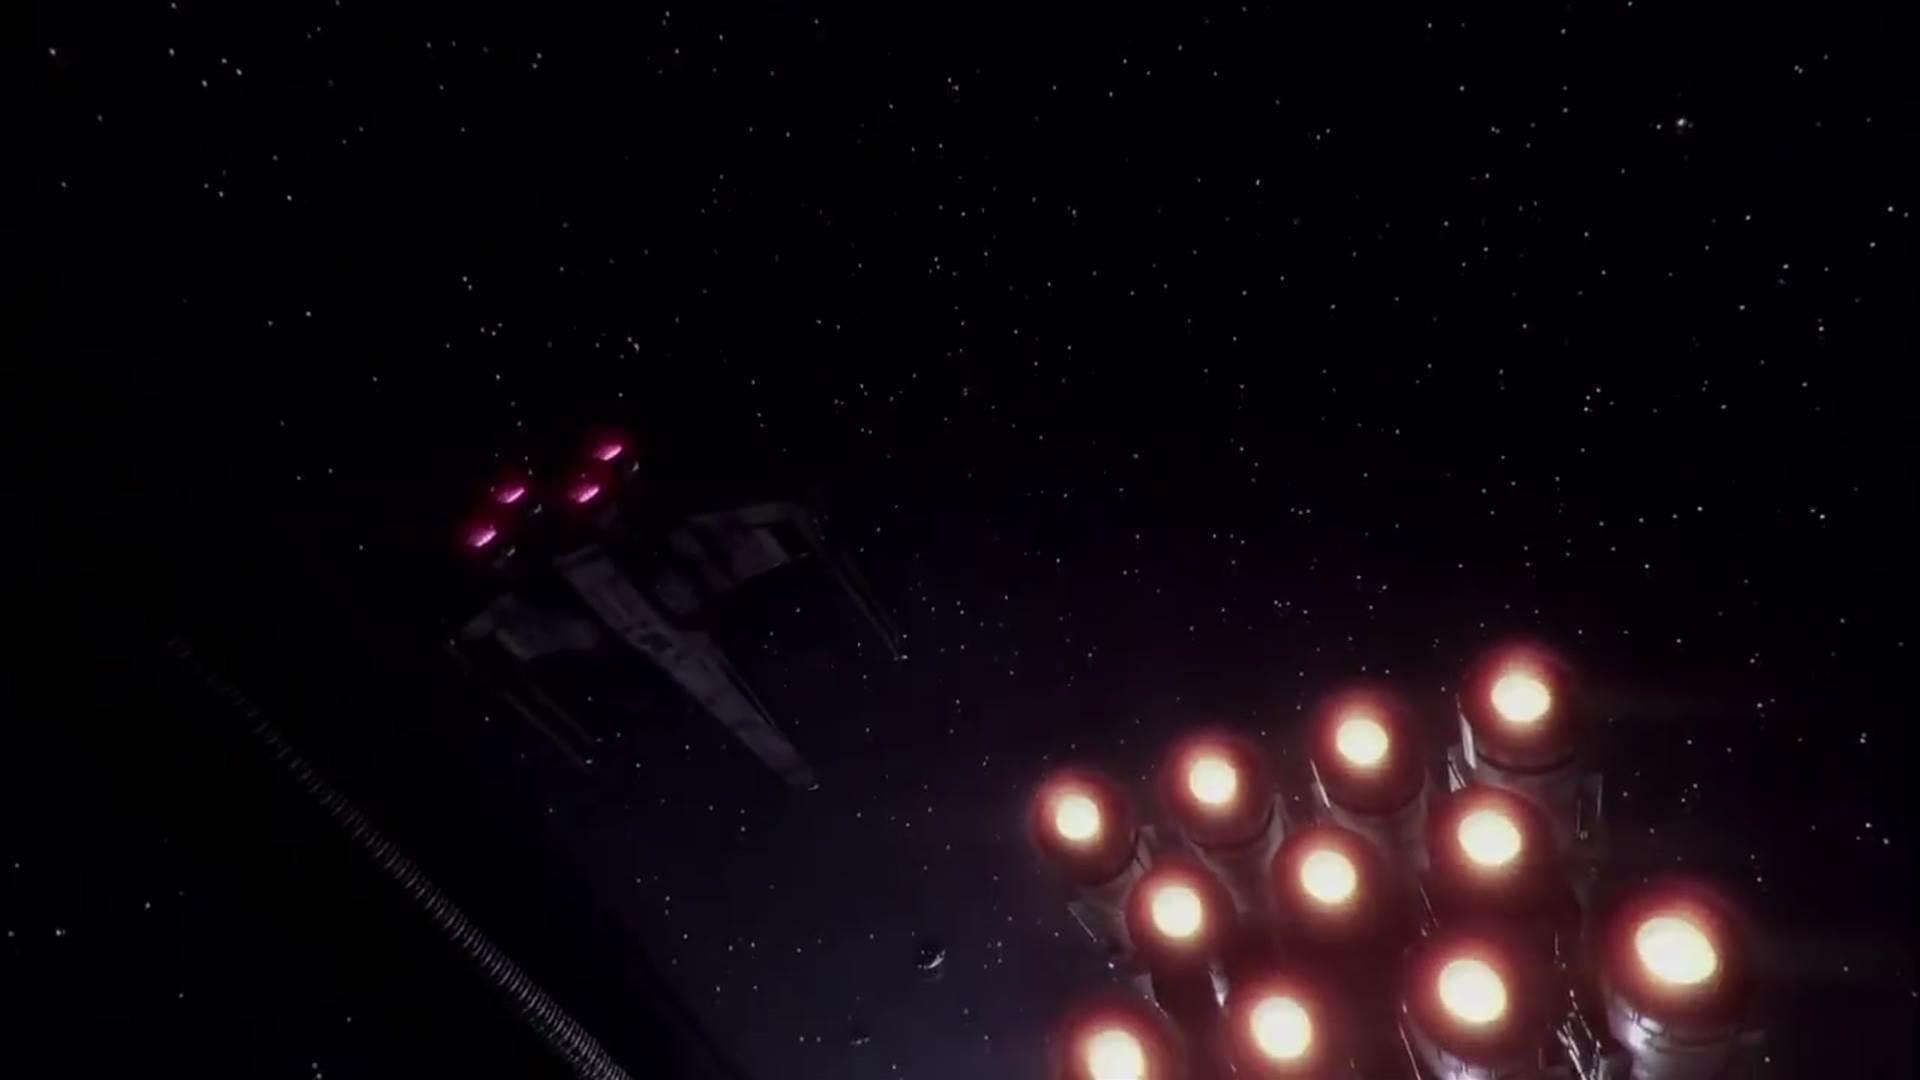 Star Wars Battlefront Rogue One: X-wing VR Mission video stills